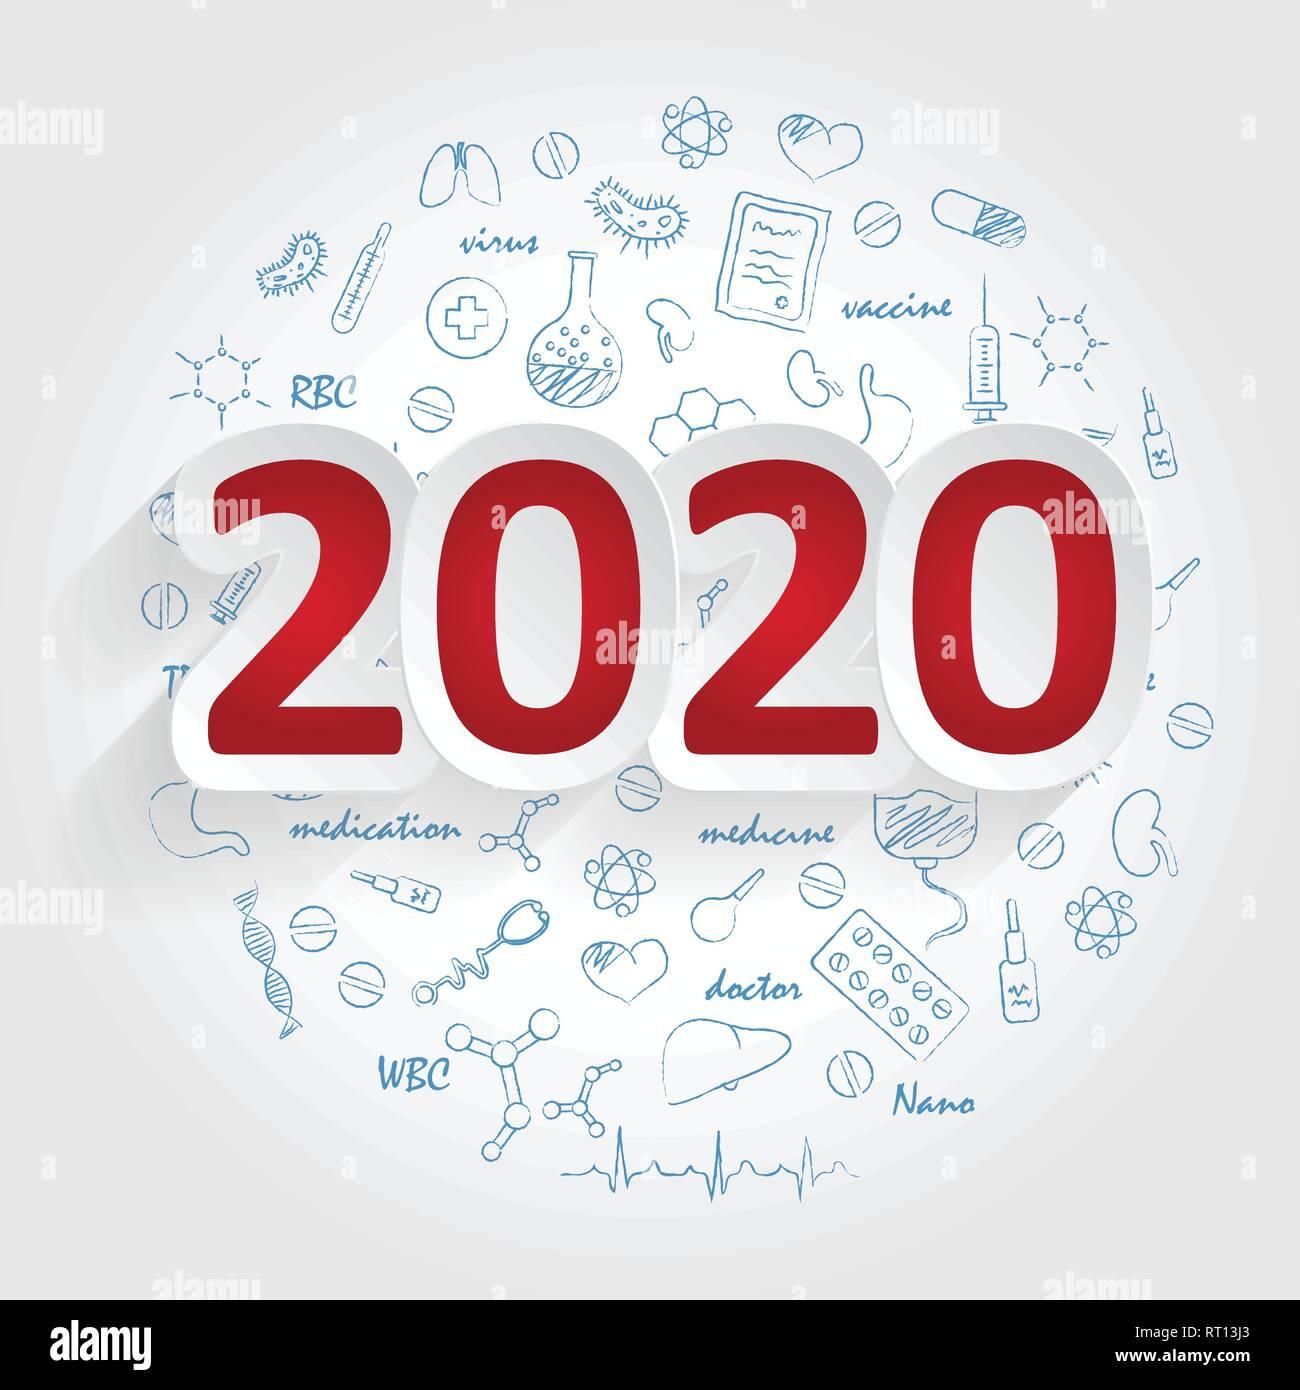 Calendario 2020 Liga Adelante.Calendario Liga Adelante 2020 2020